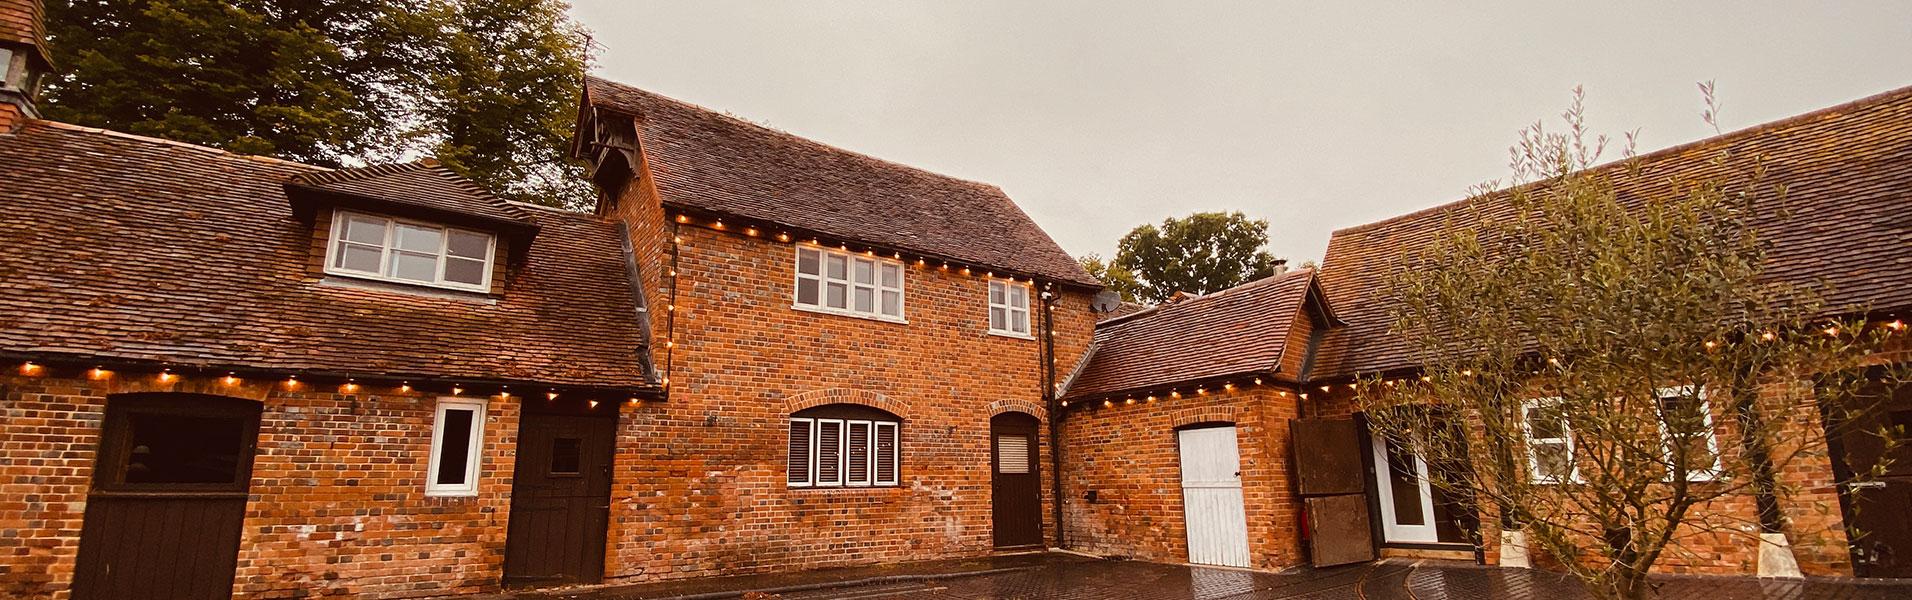 Herons-Farm-Festoon-Lights-for-Hire-West-Berkshire